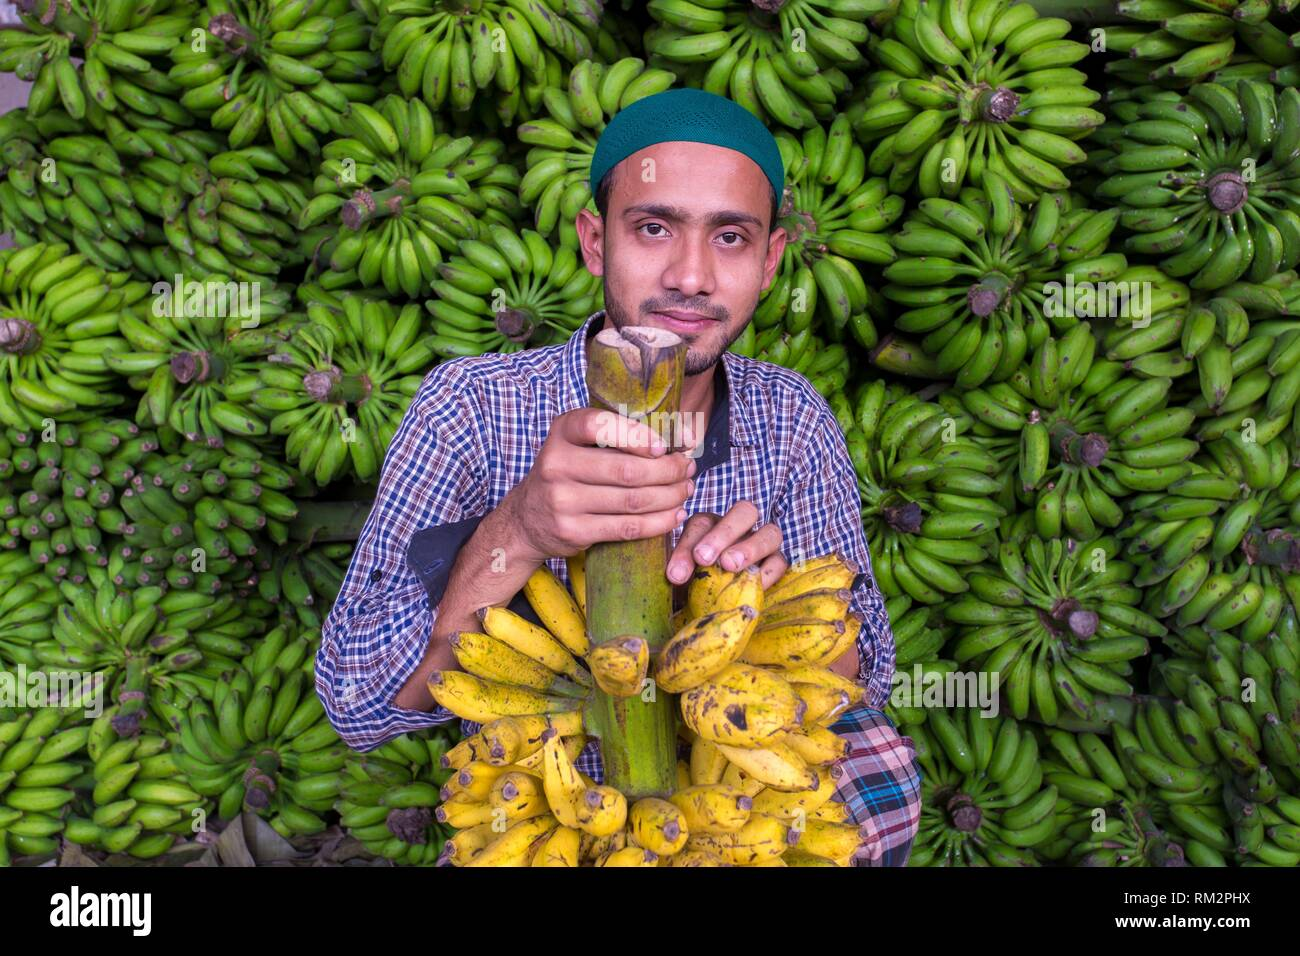 A banana vendor in green banana background that's why he showing branches of Ripe bananas at Dhaka, Bangladesh. - Stock Image